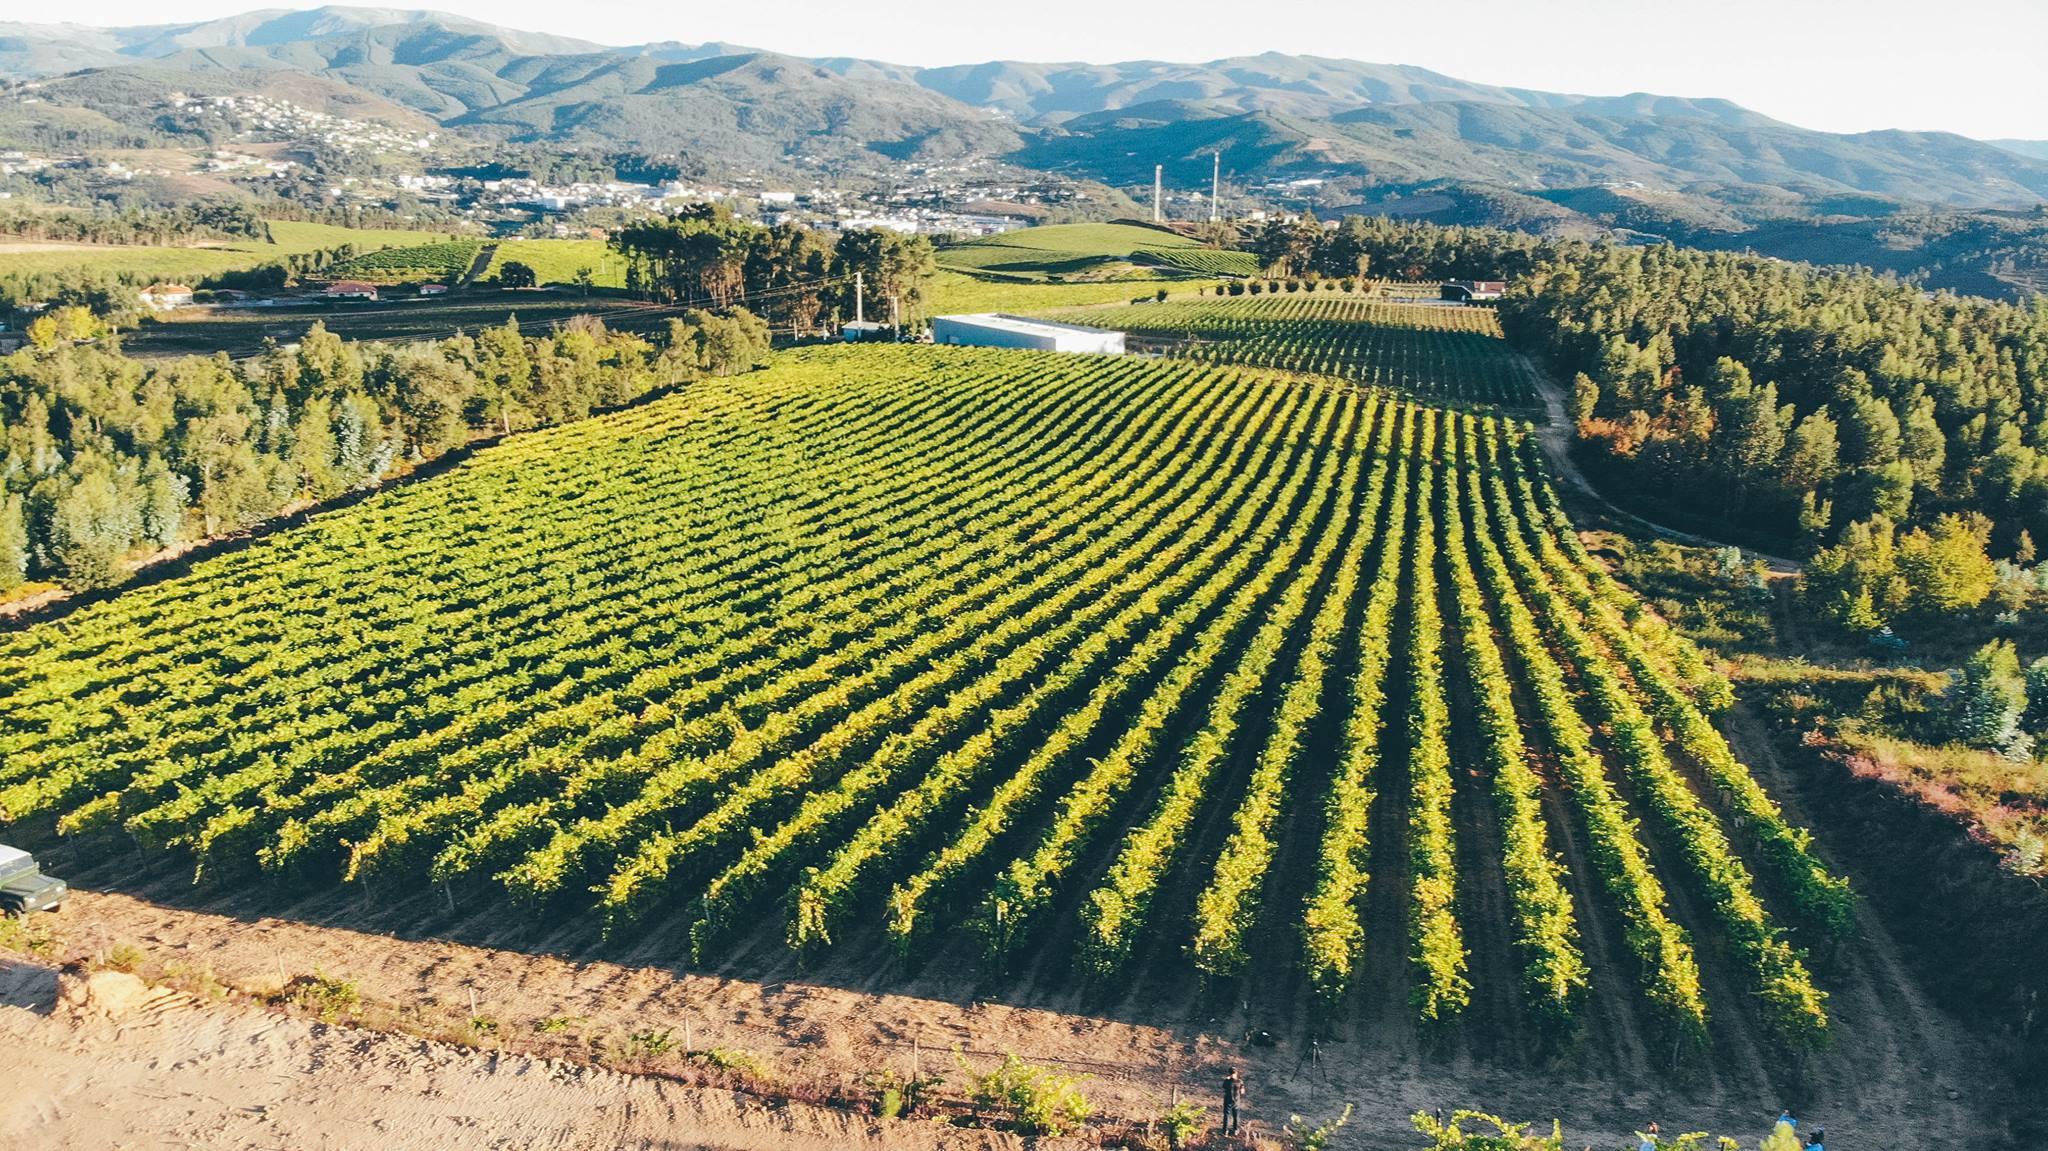 quinta da raza lush vineyard near winery in lovely portugal